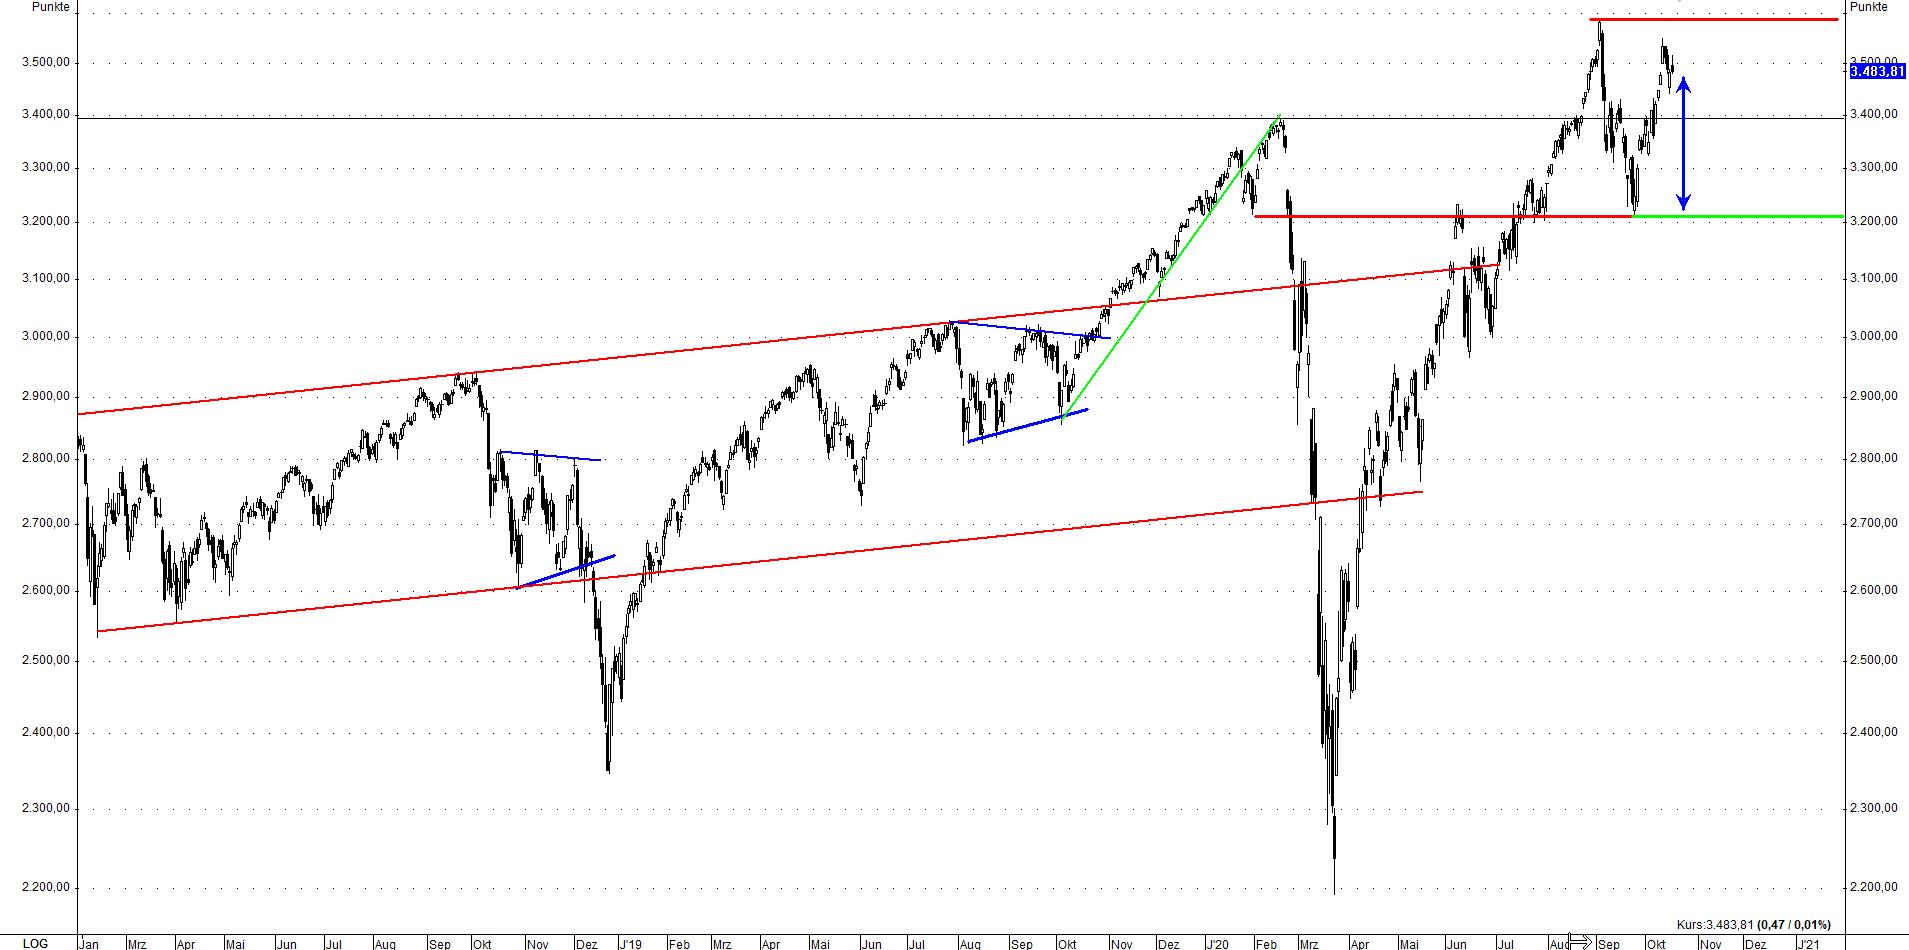 S&P 500 19.10.2020